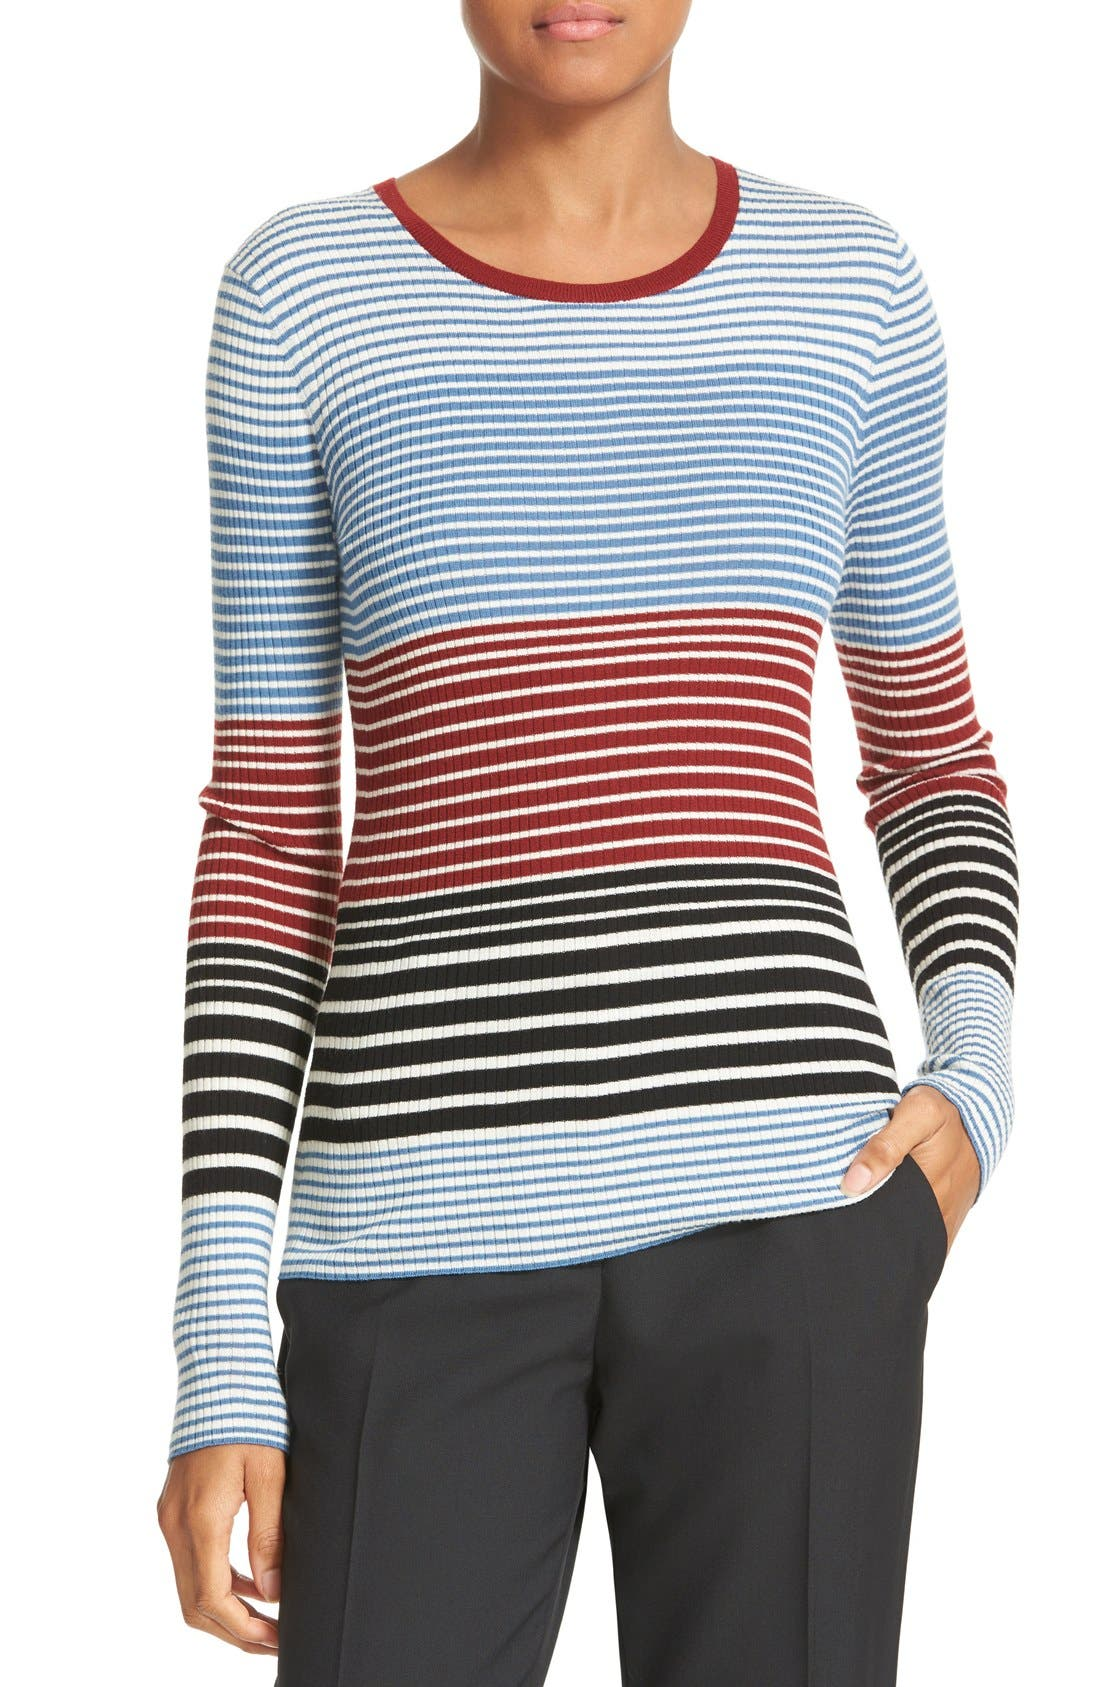 Main Image - Theory Mirzi Stripe Rib Knit Merino Sweater